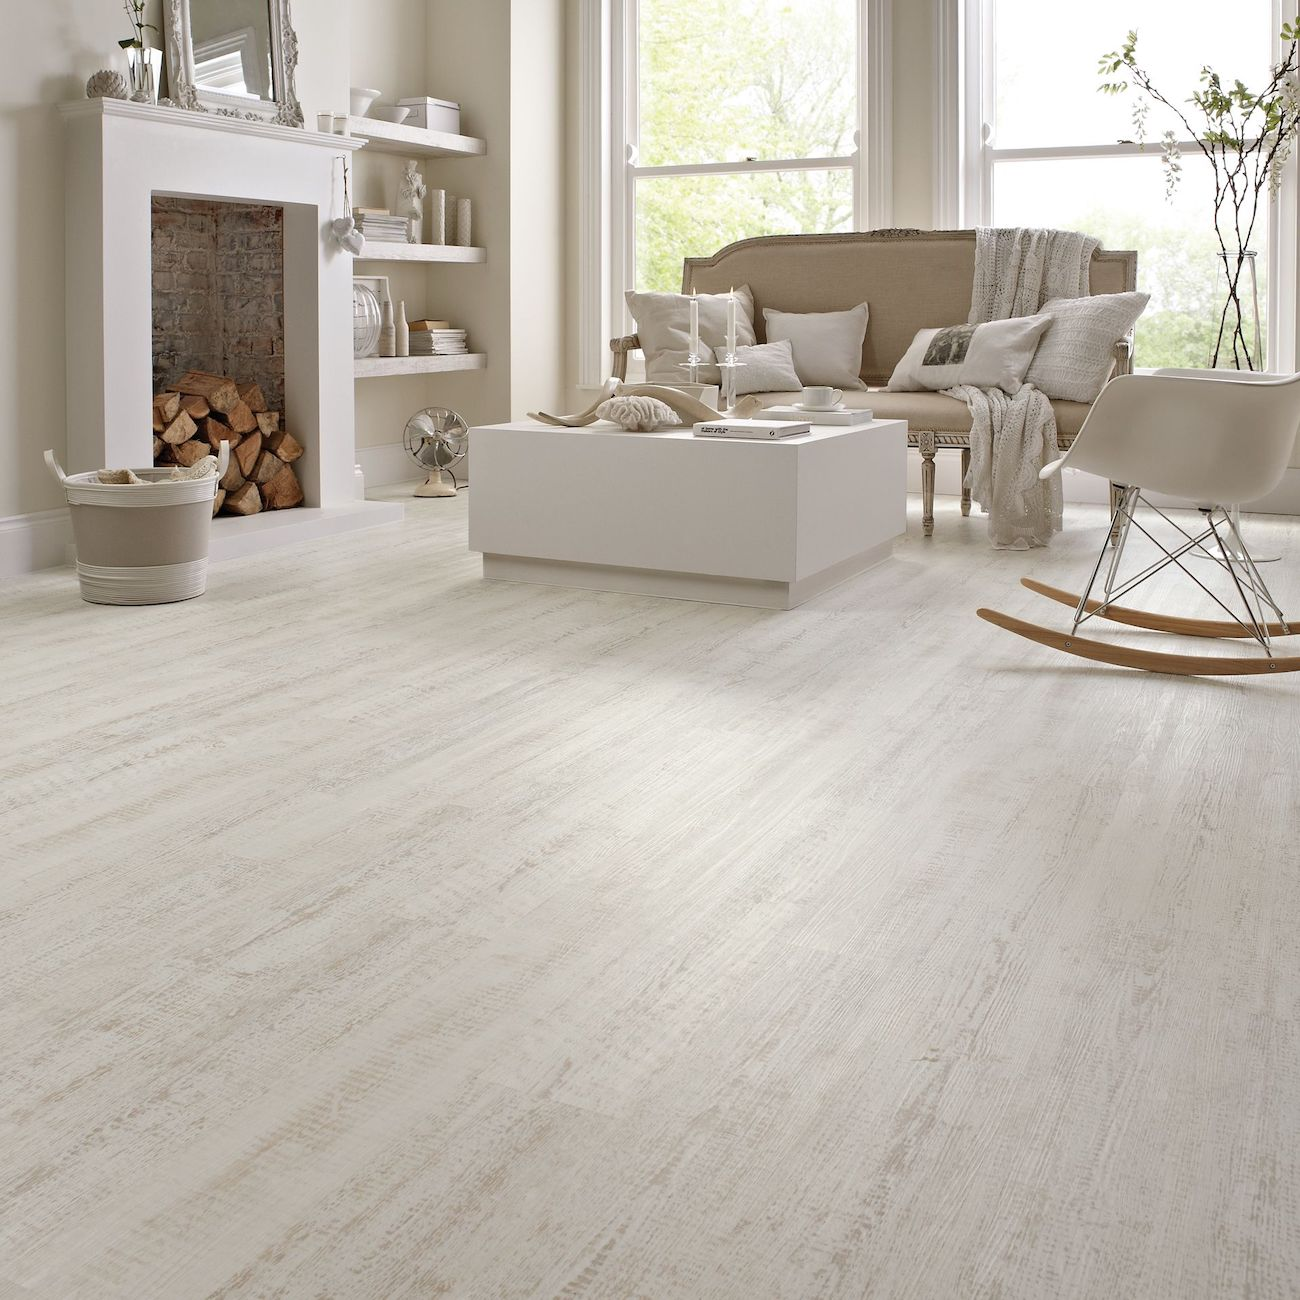 White Vinyl Flooring Ideas